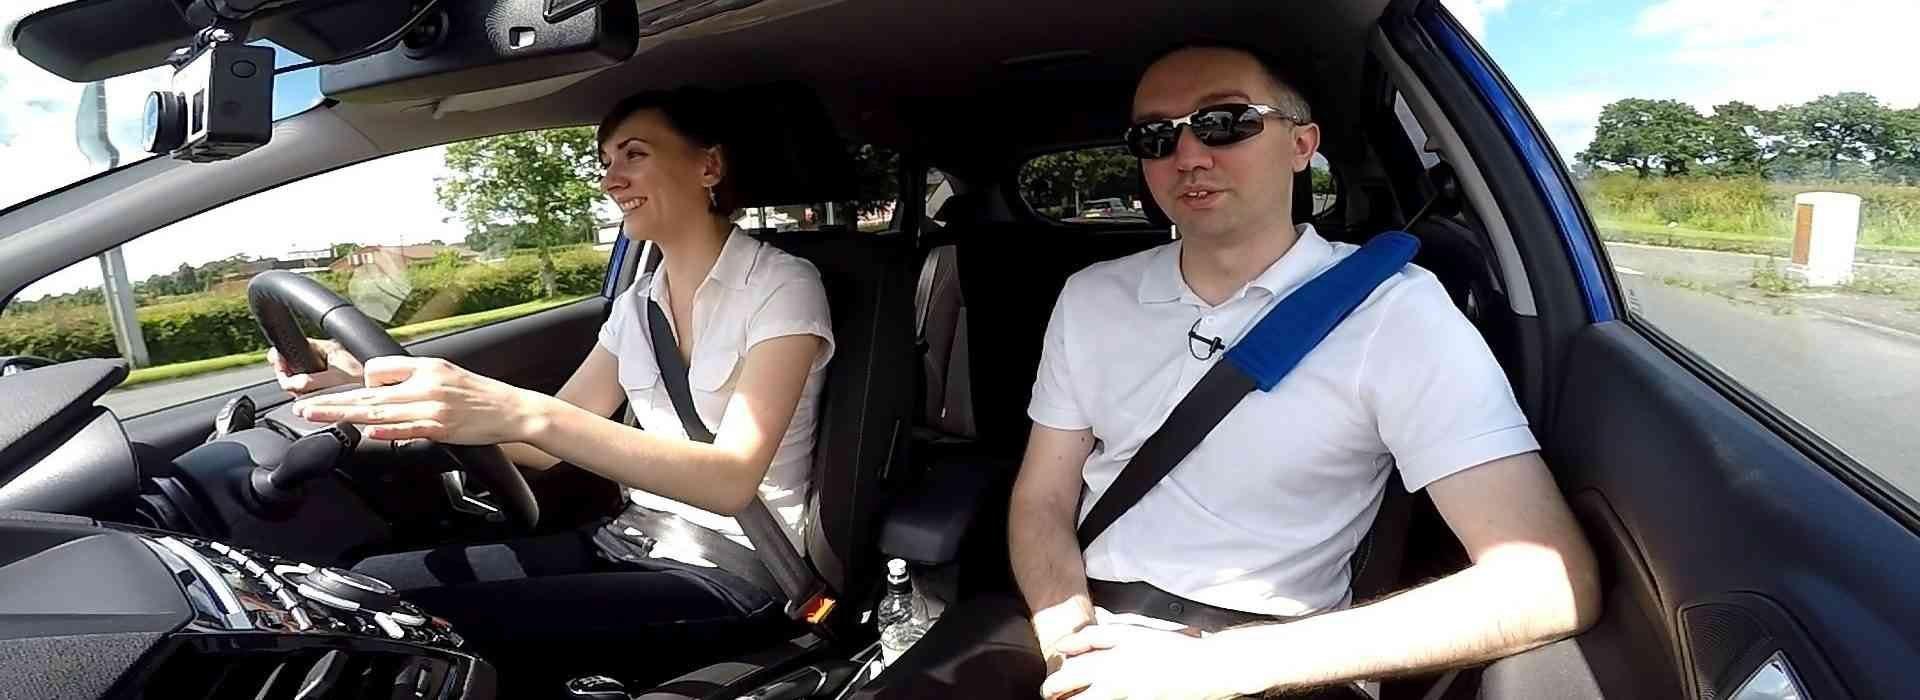 Driving lessons Birmingham